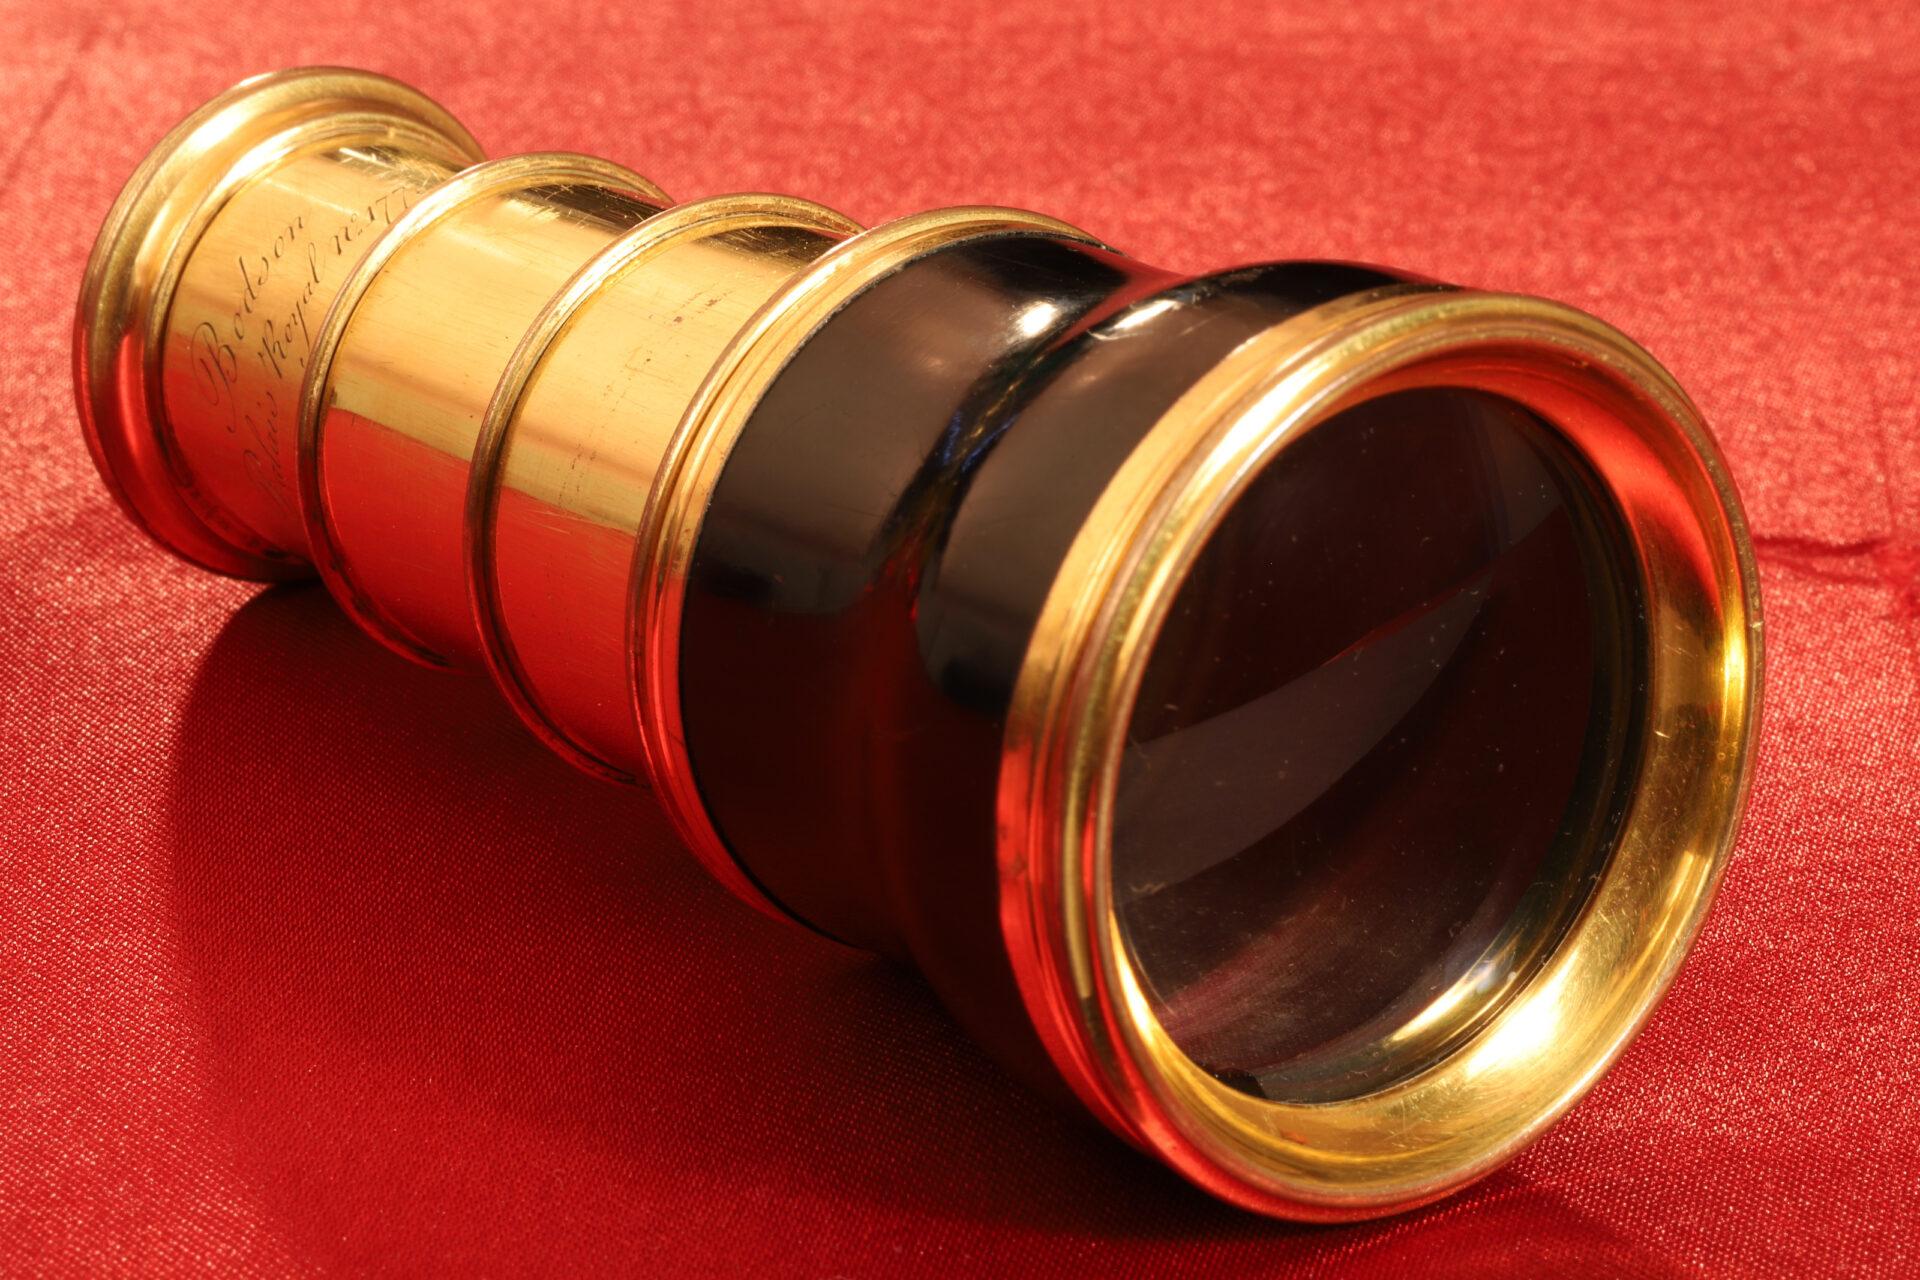 Image of extended Bodson Monocular Spyglass c1825